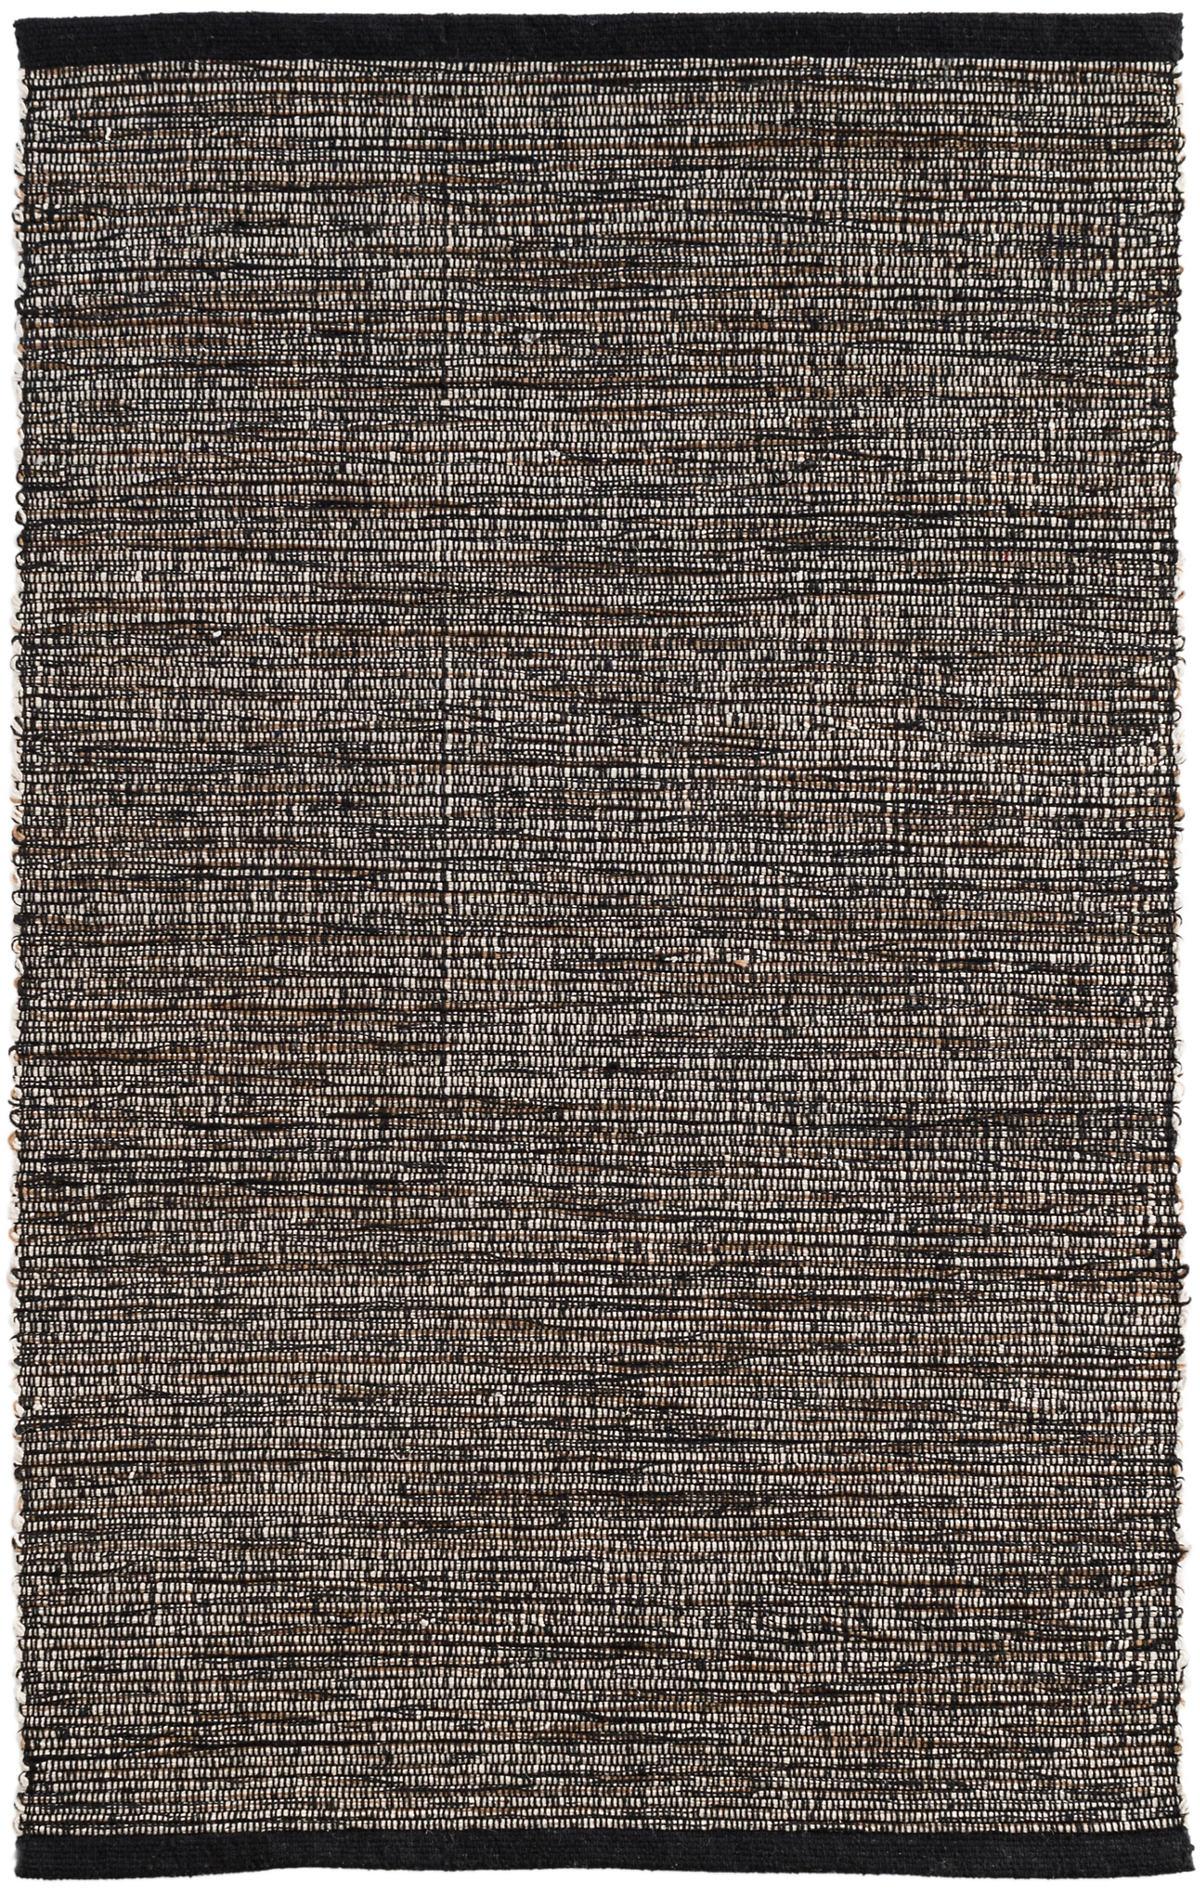 Grant Black/Brown Woven Cotton Rug